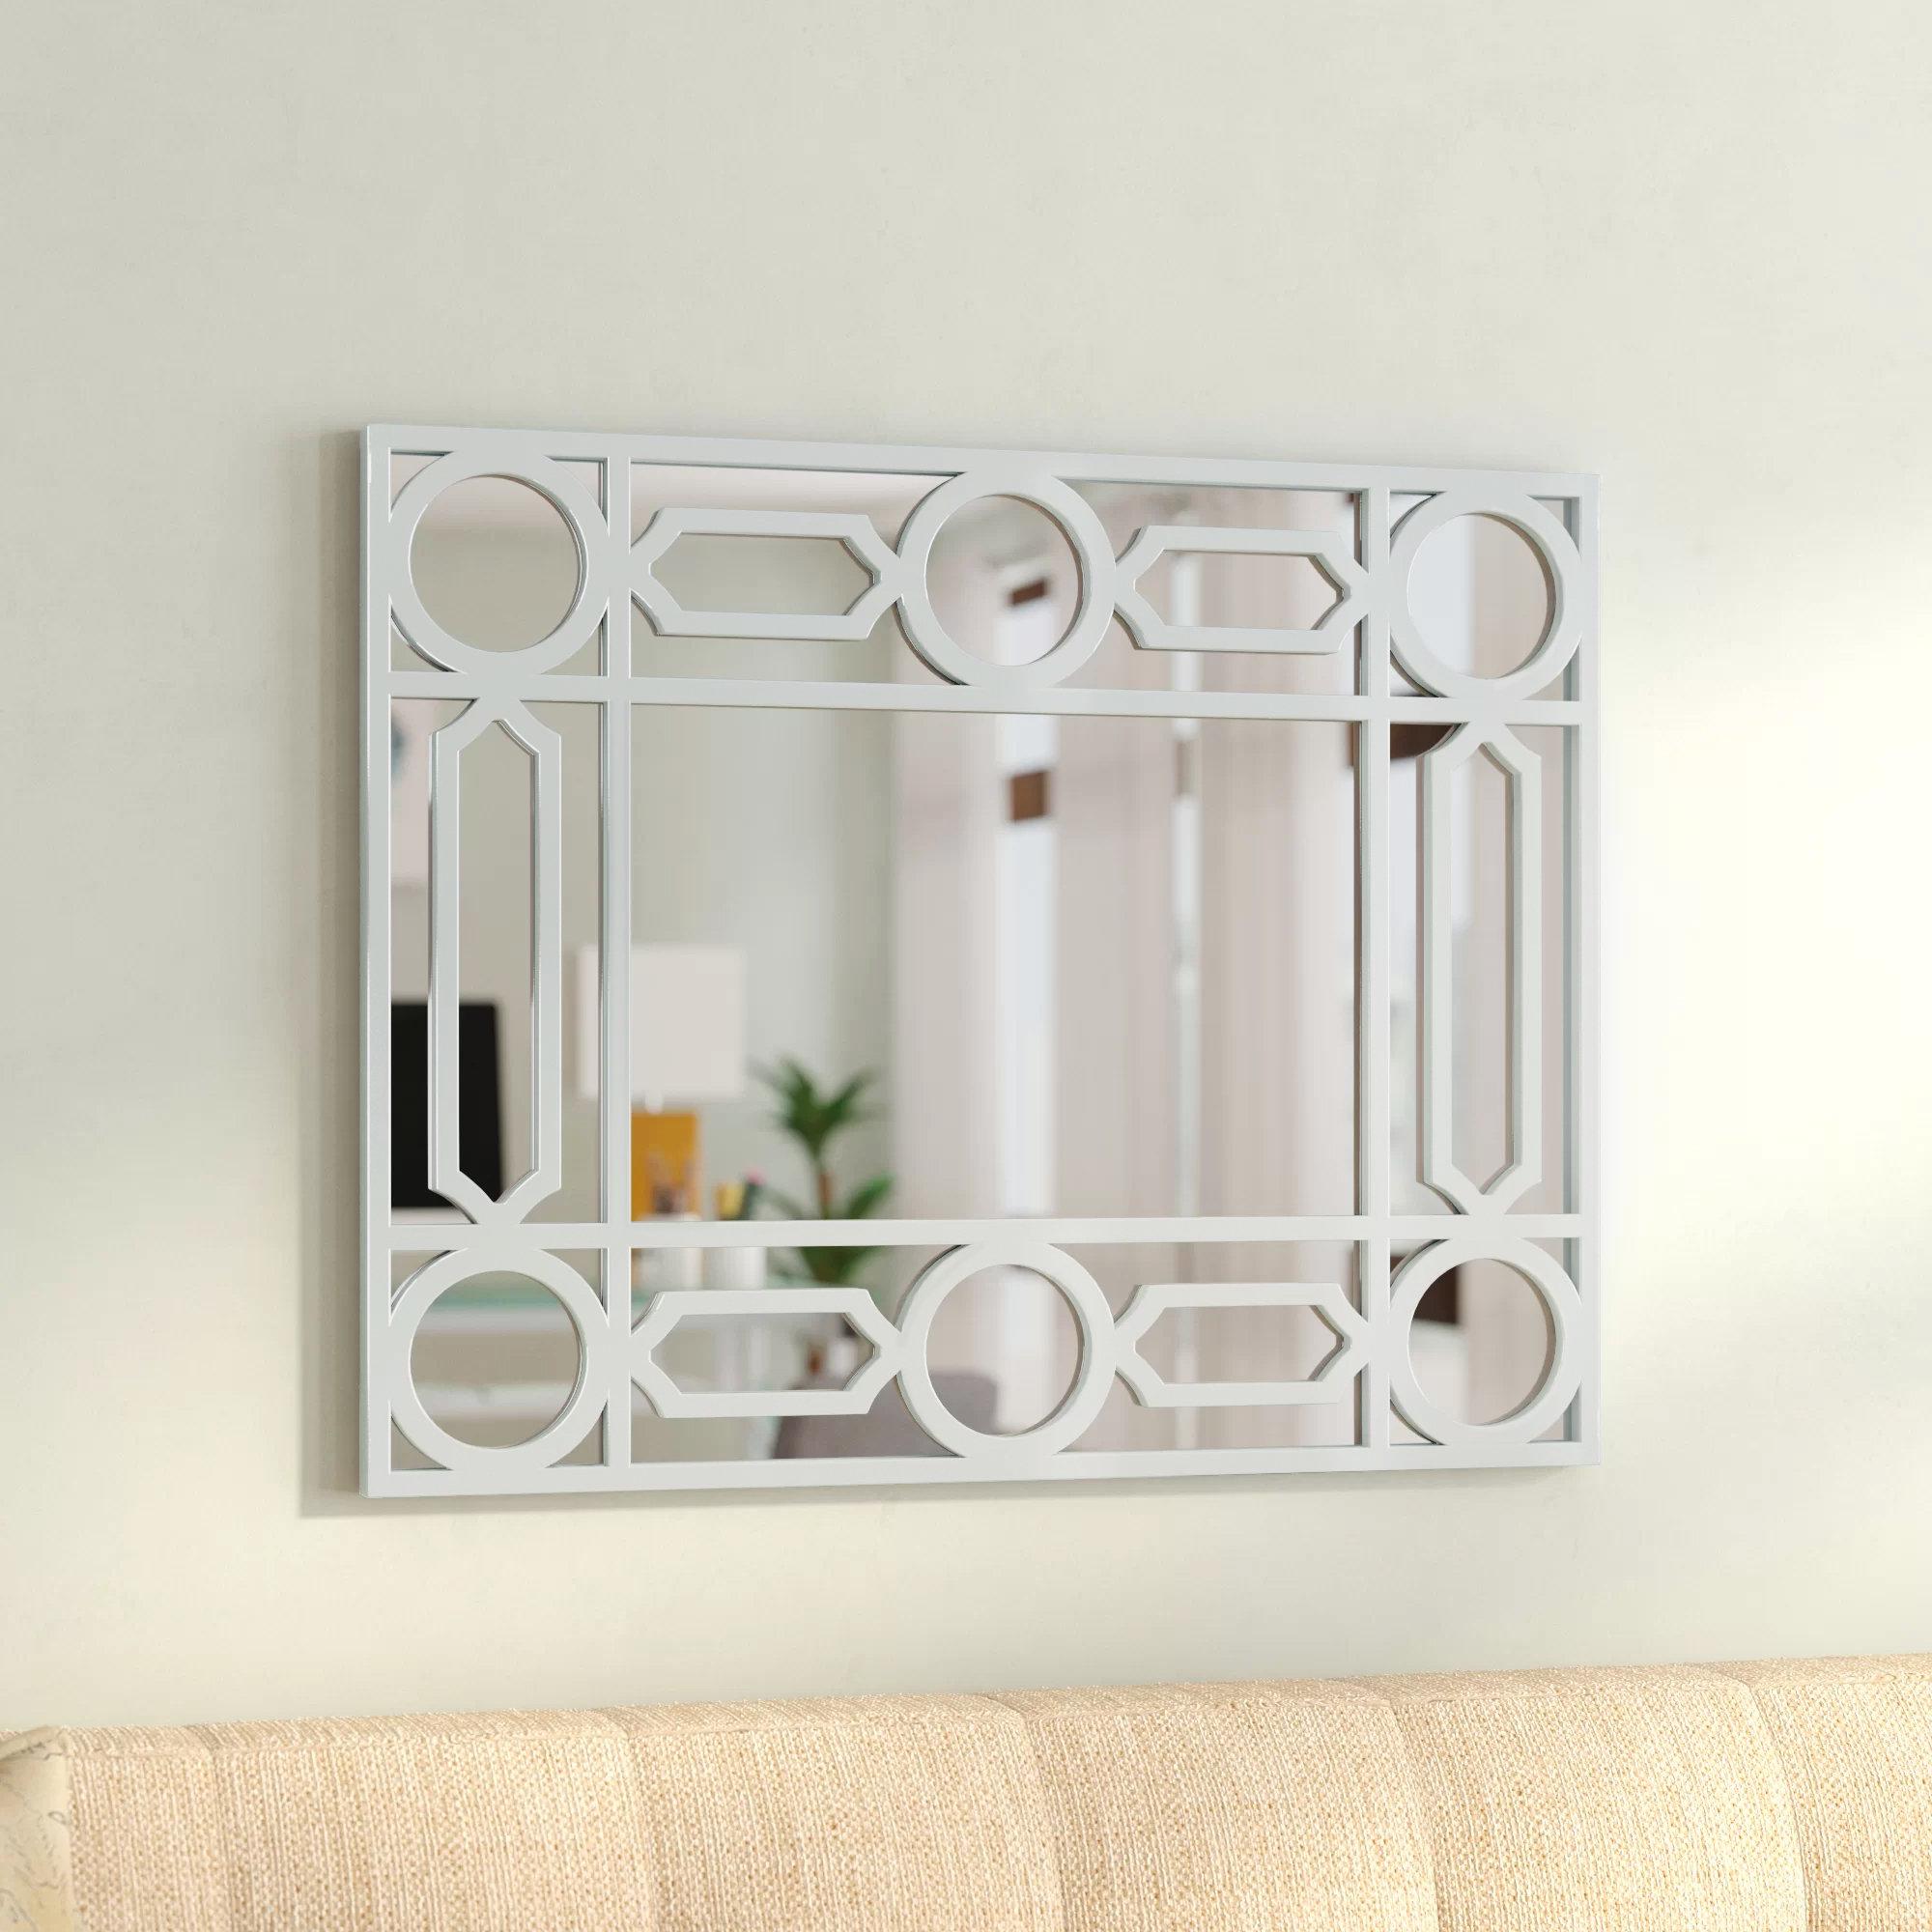 Geometric Wall Mirror | Wayfair With Rectangle Ornate Geometric Wall Mirrors (View 15 of 20)